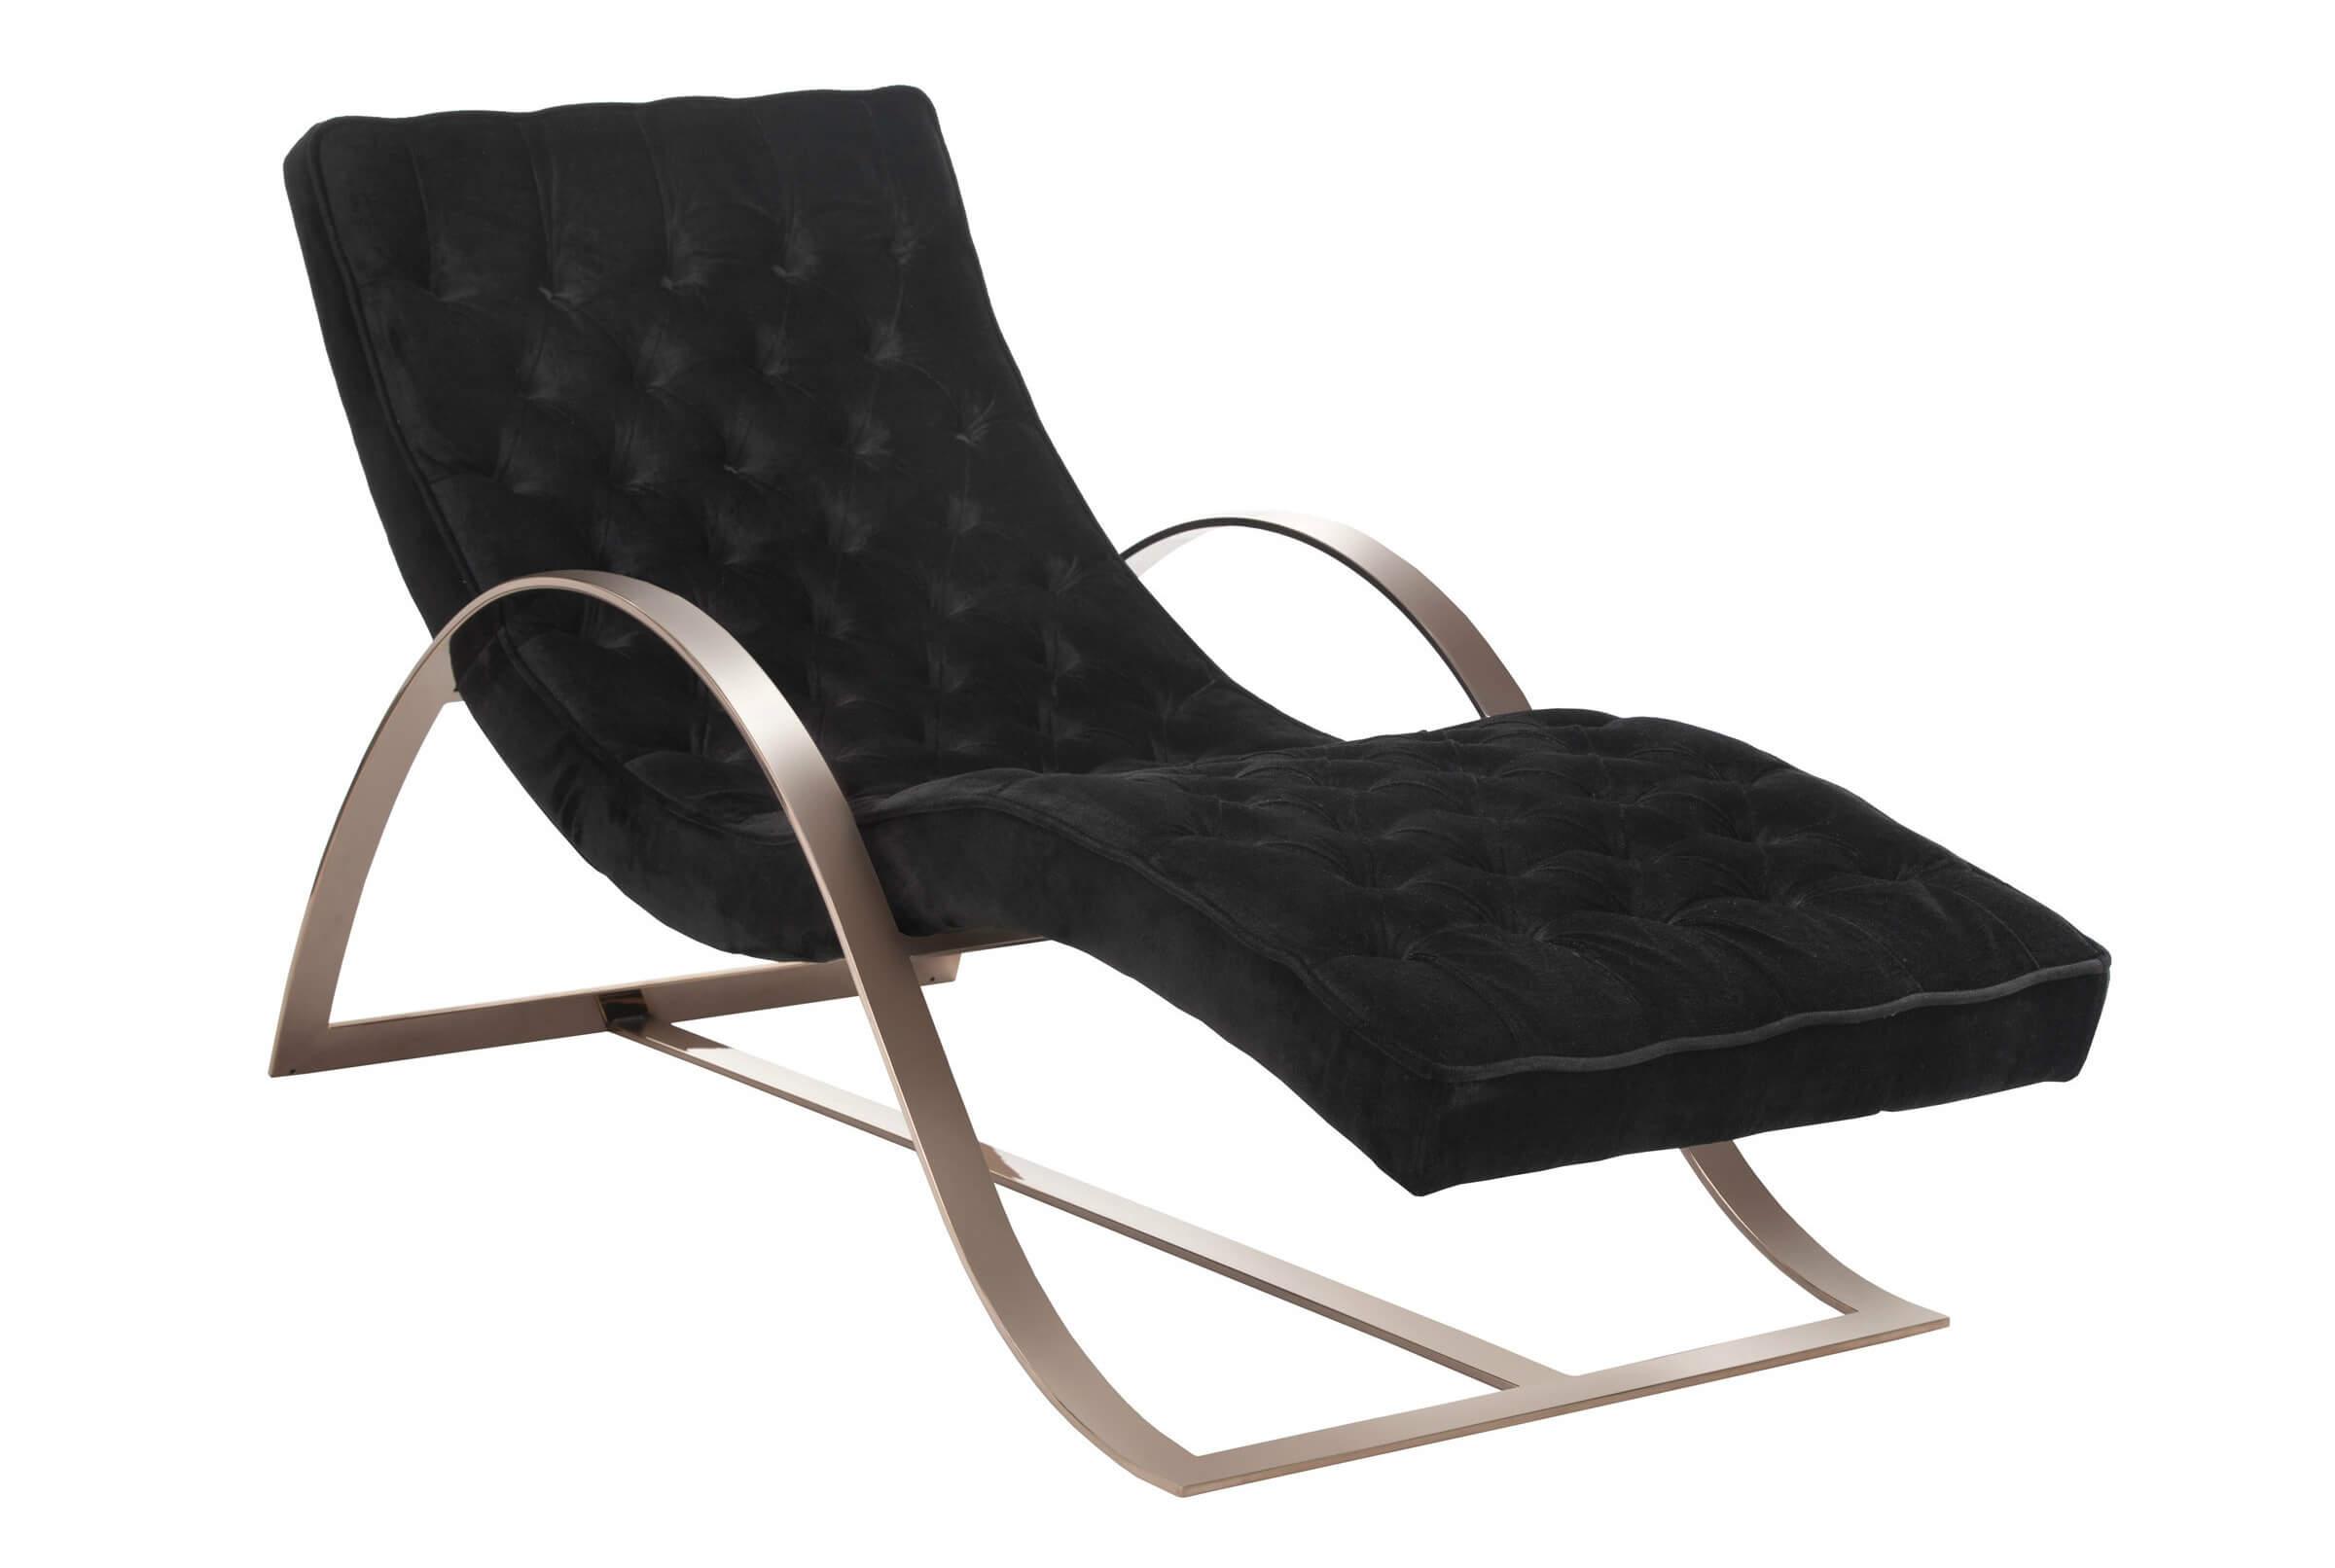 3black-chaise-lounge